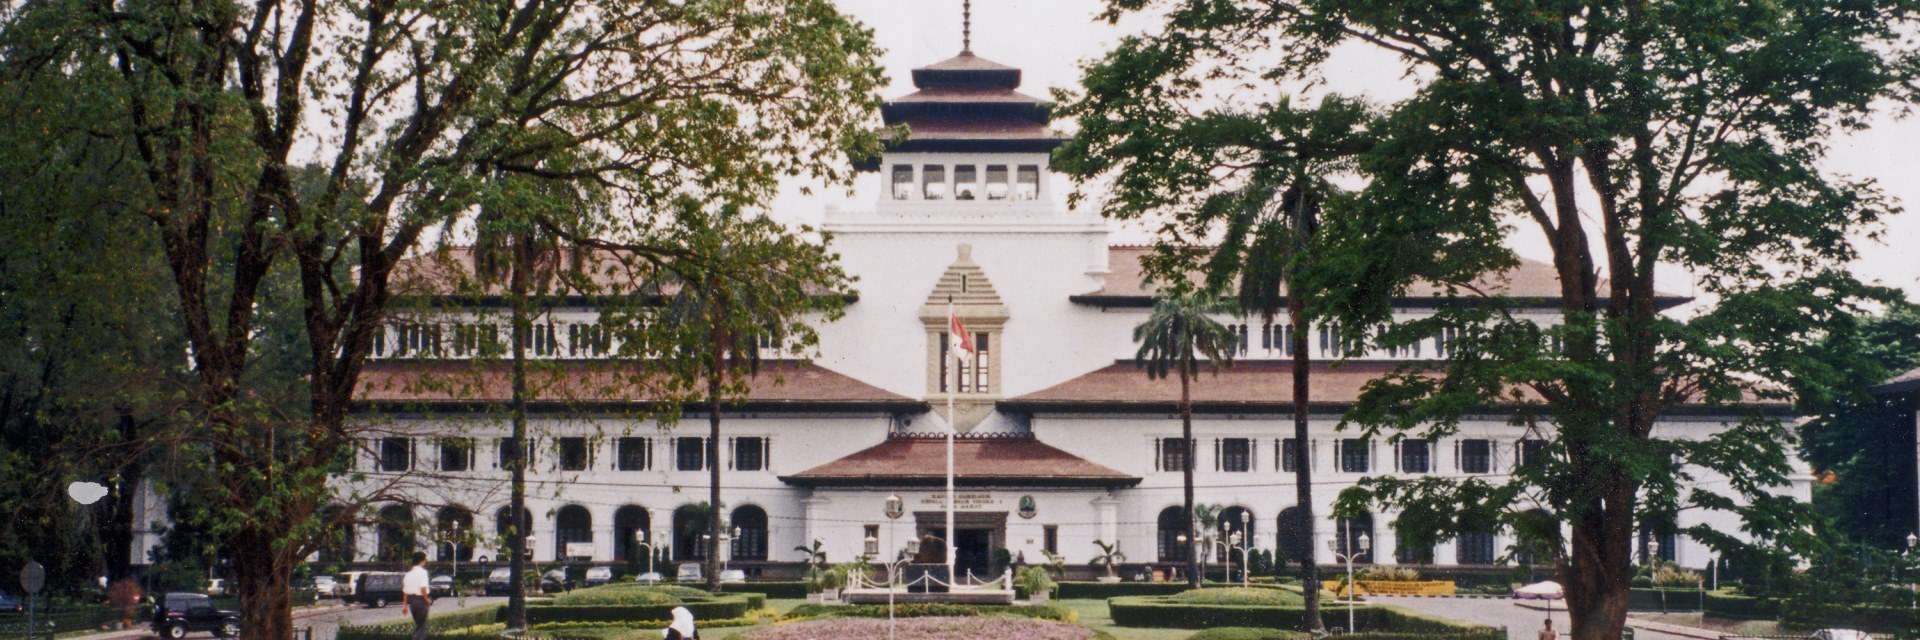 Bangunan Bersejarah Terpopuler Bandung Bangunan Bersejarah Terpopuler Bandung - Dolan Dolen